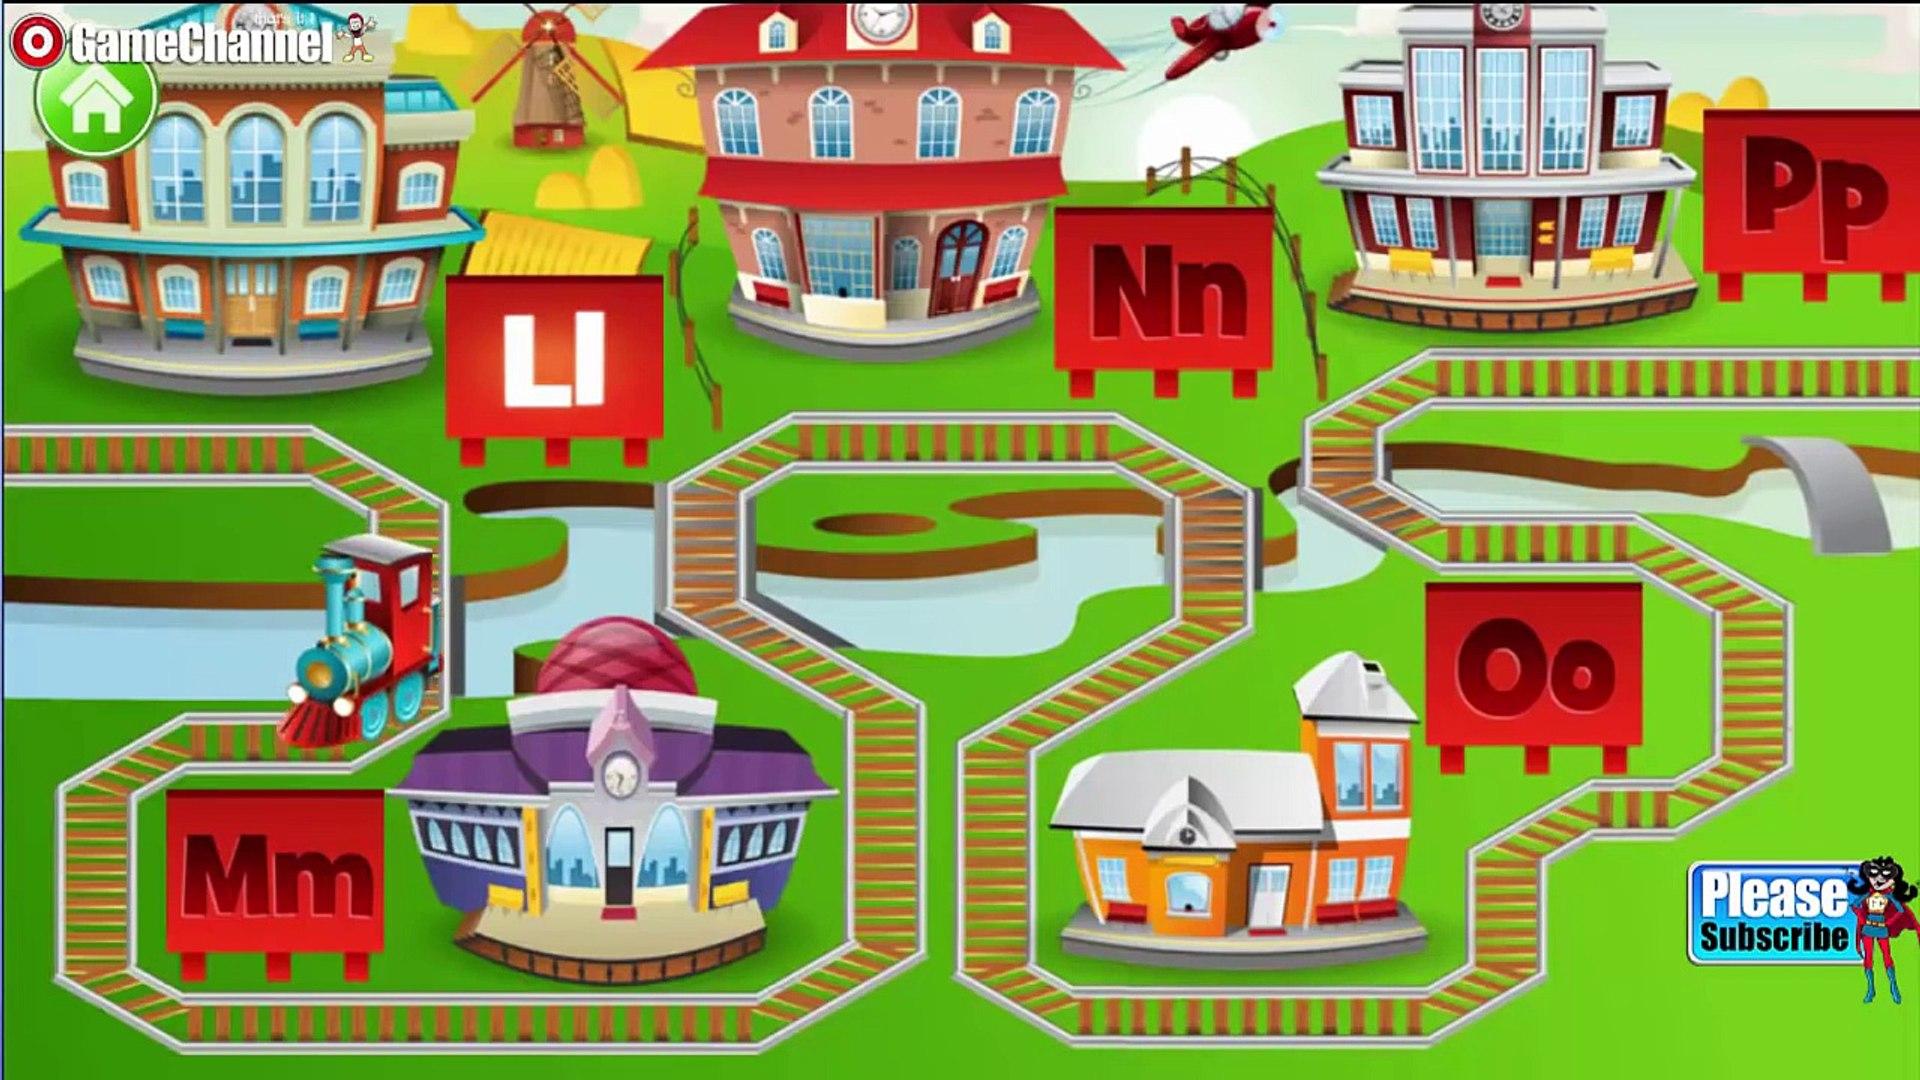 Kids ABC Letter Trains Educational Education 'Preschool Learning' kids ages 2-7 #1